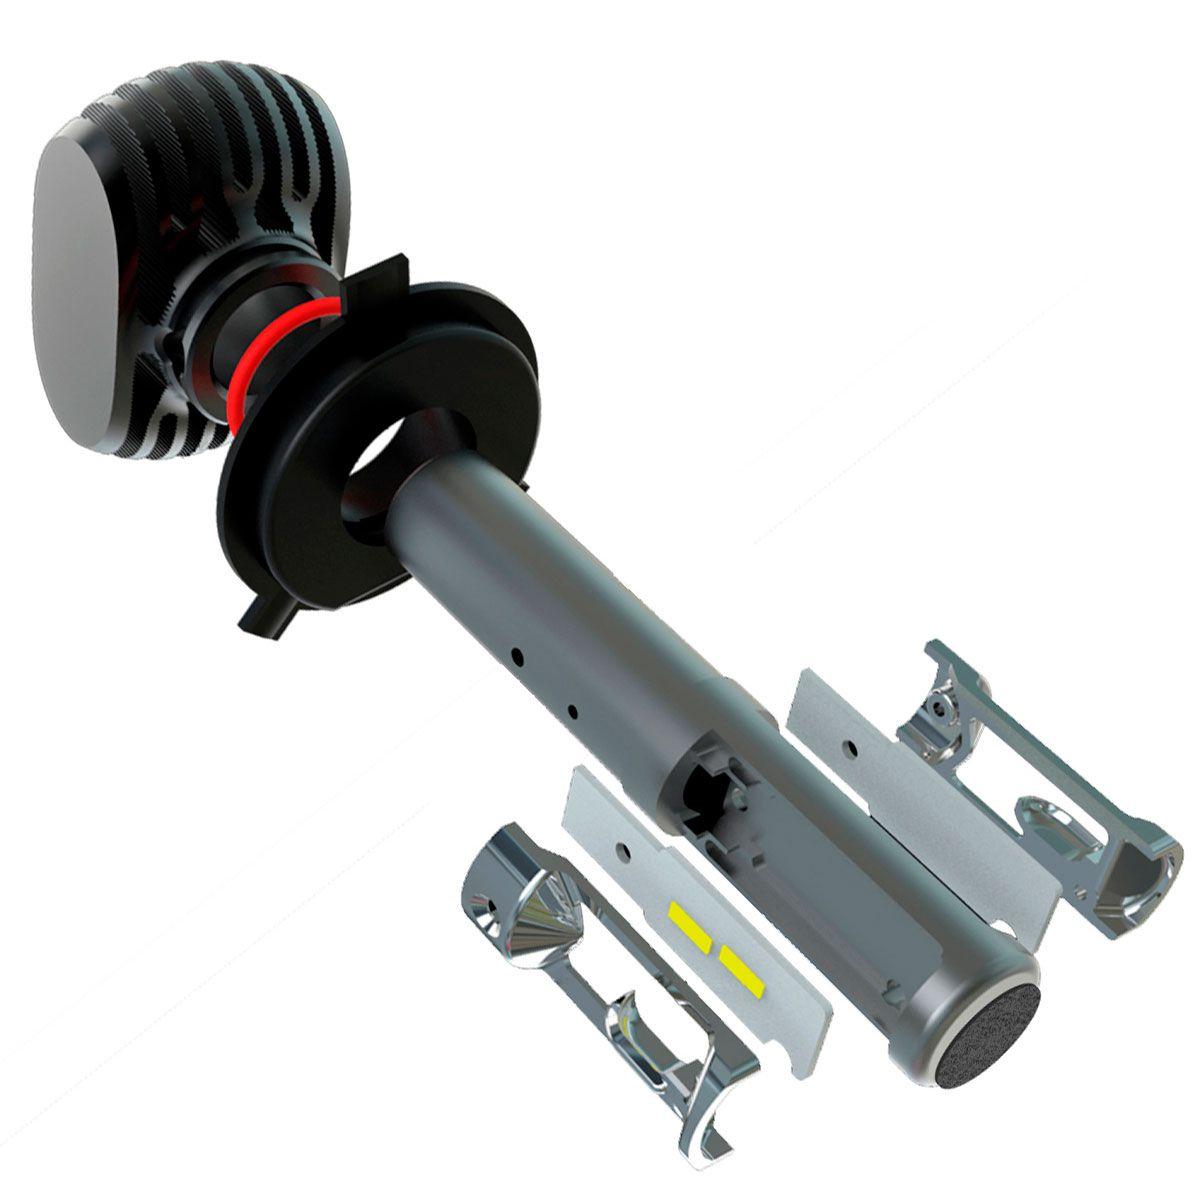 Kit Ultra LED Strada 1996 1997 1998 1999 2000 2001 tipo xenon farol alto e baixo H4 50W